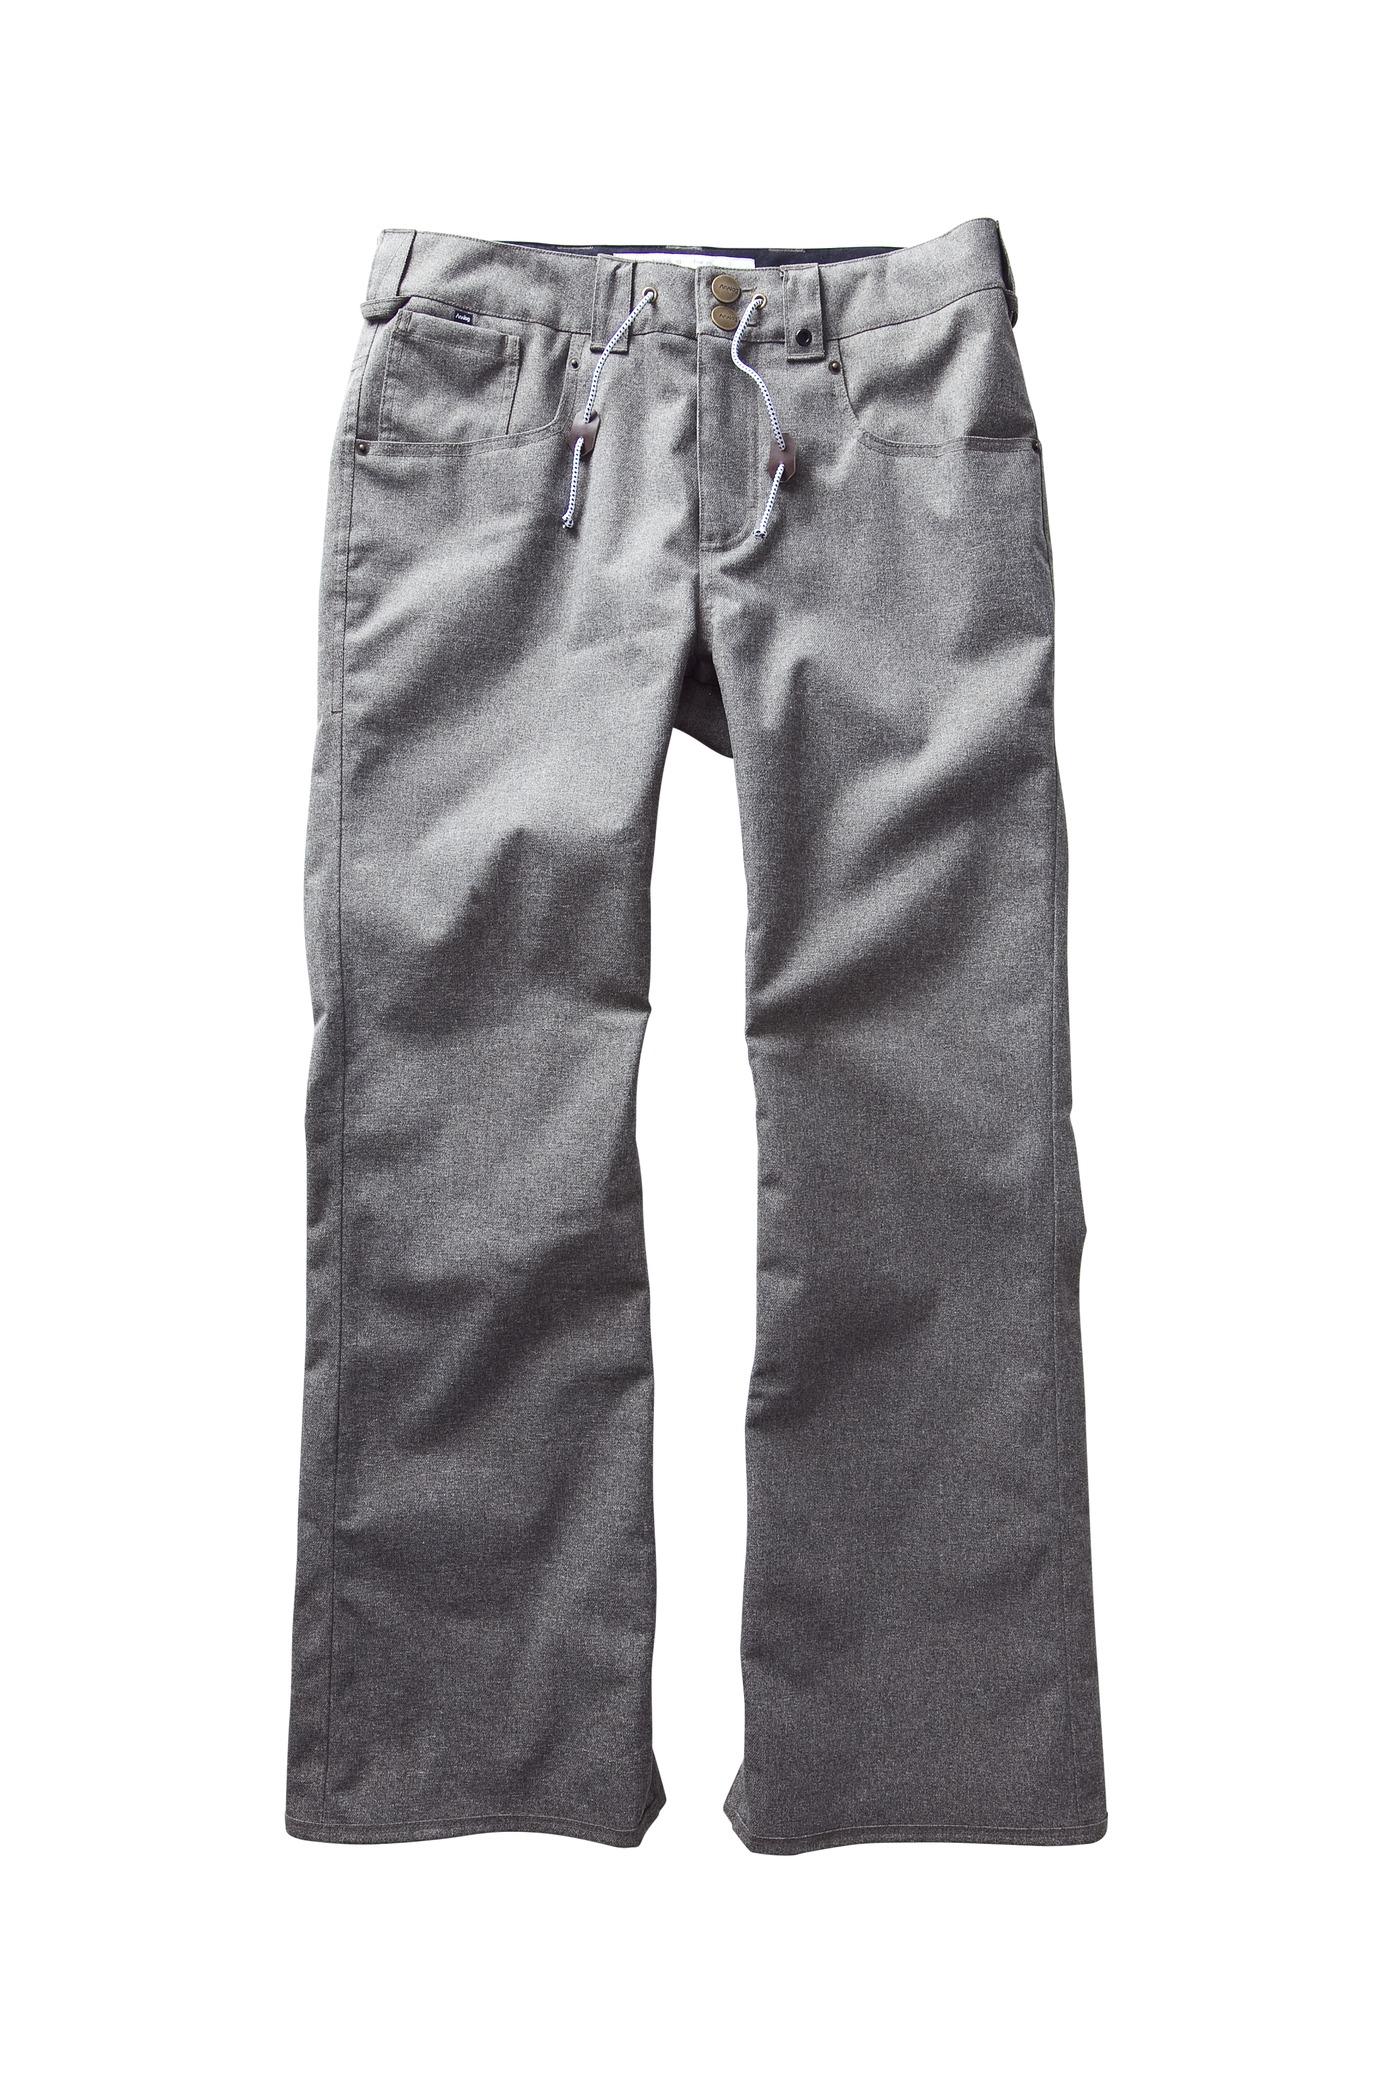 Spodnie Snowboardowe Analog Remer (Vintage Khaki)